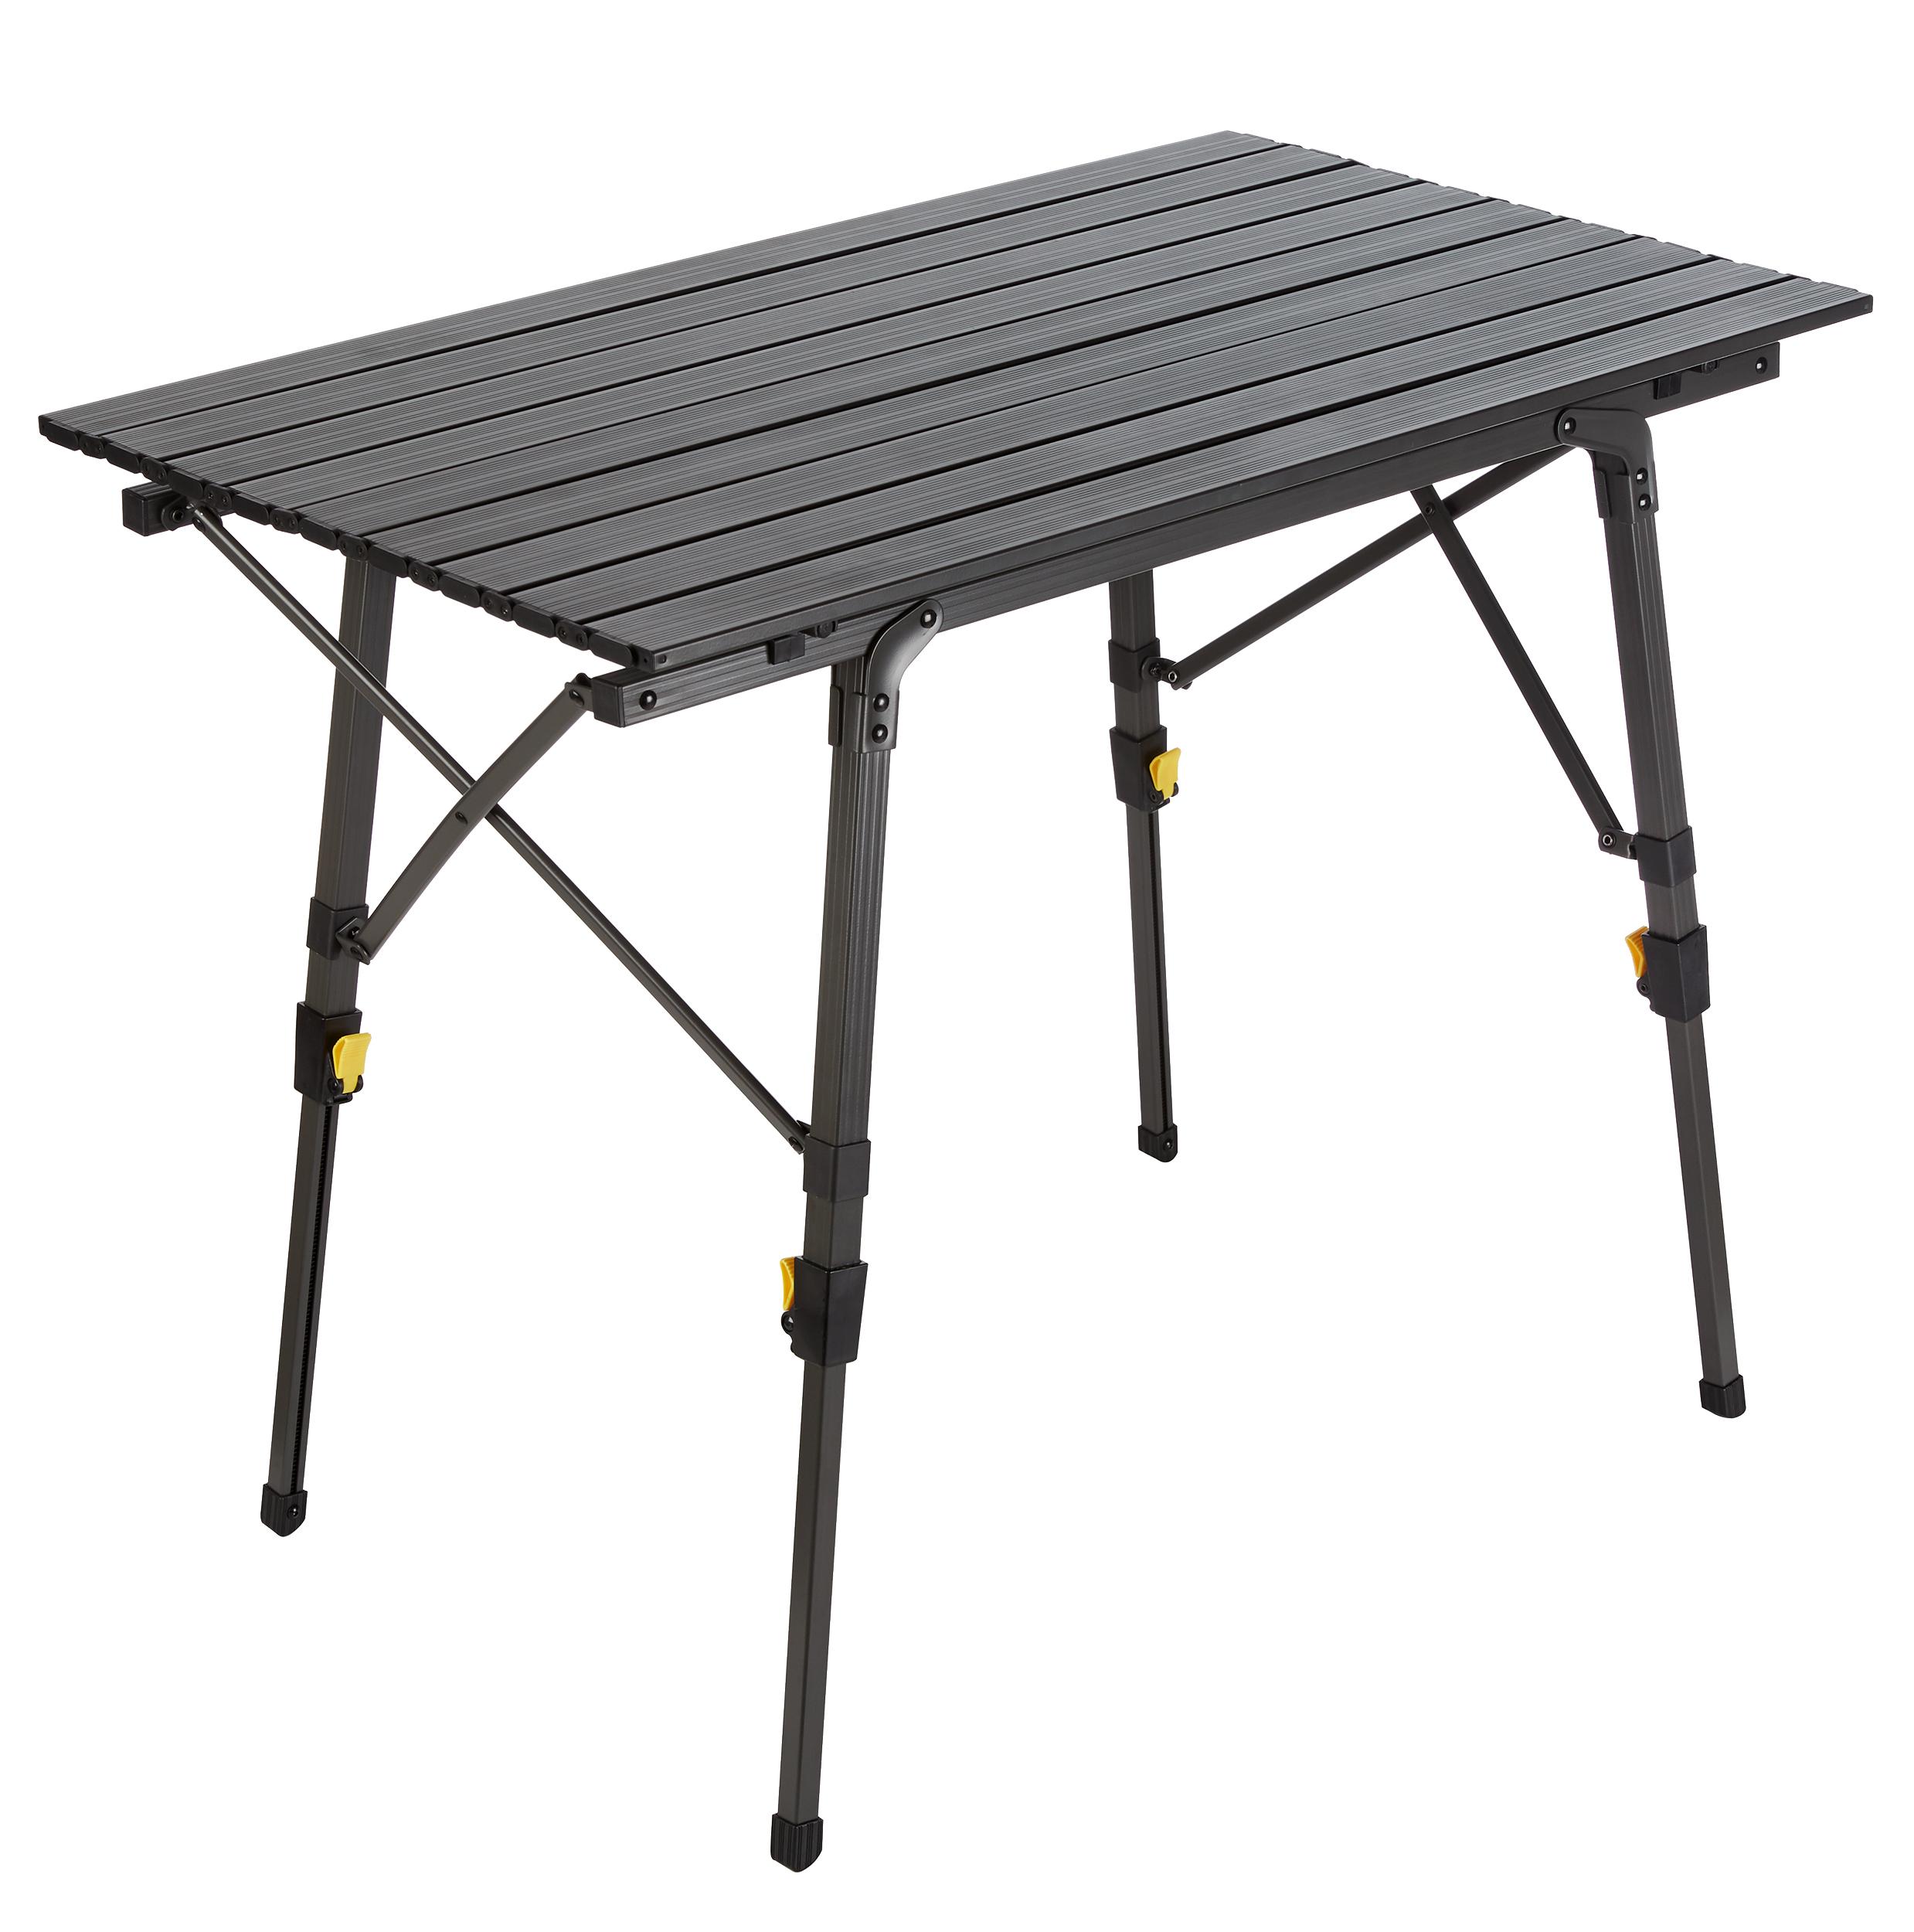 b3bb4f7a0d9 Camping tables